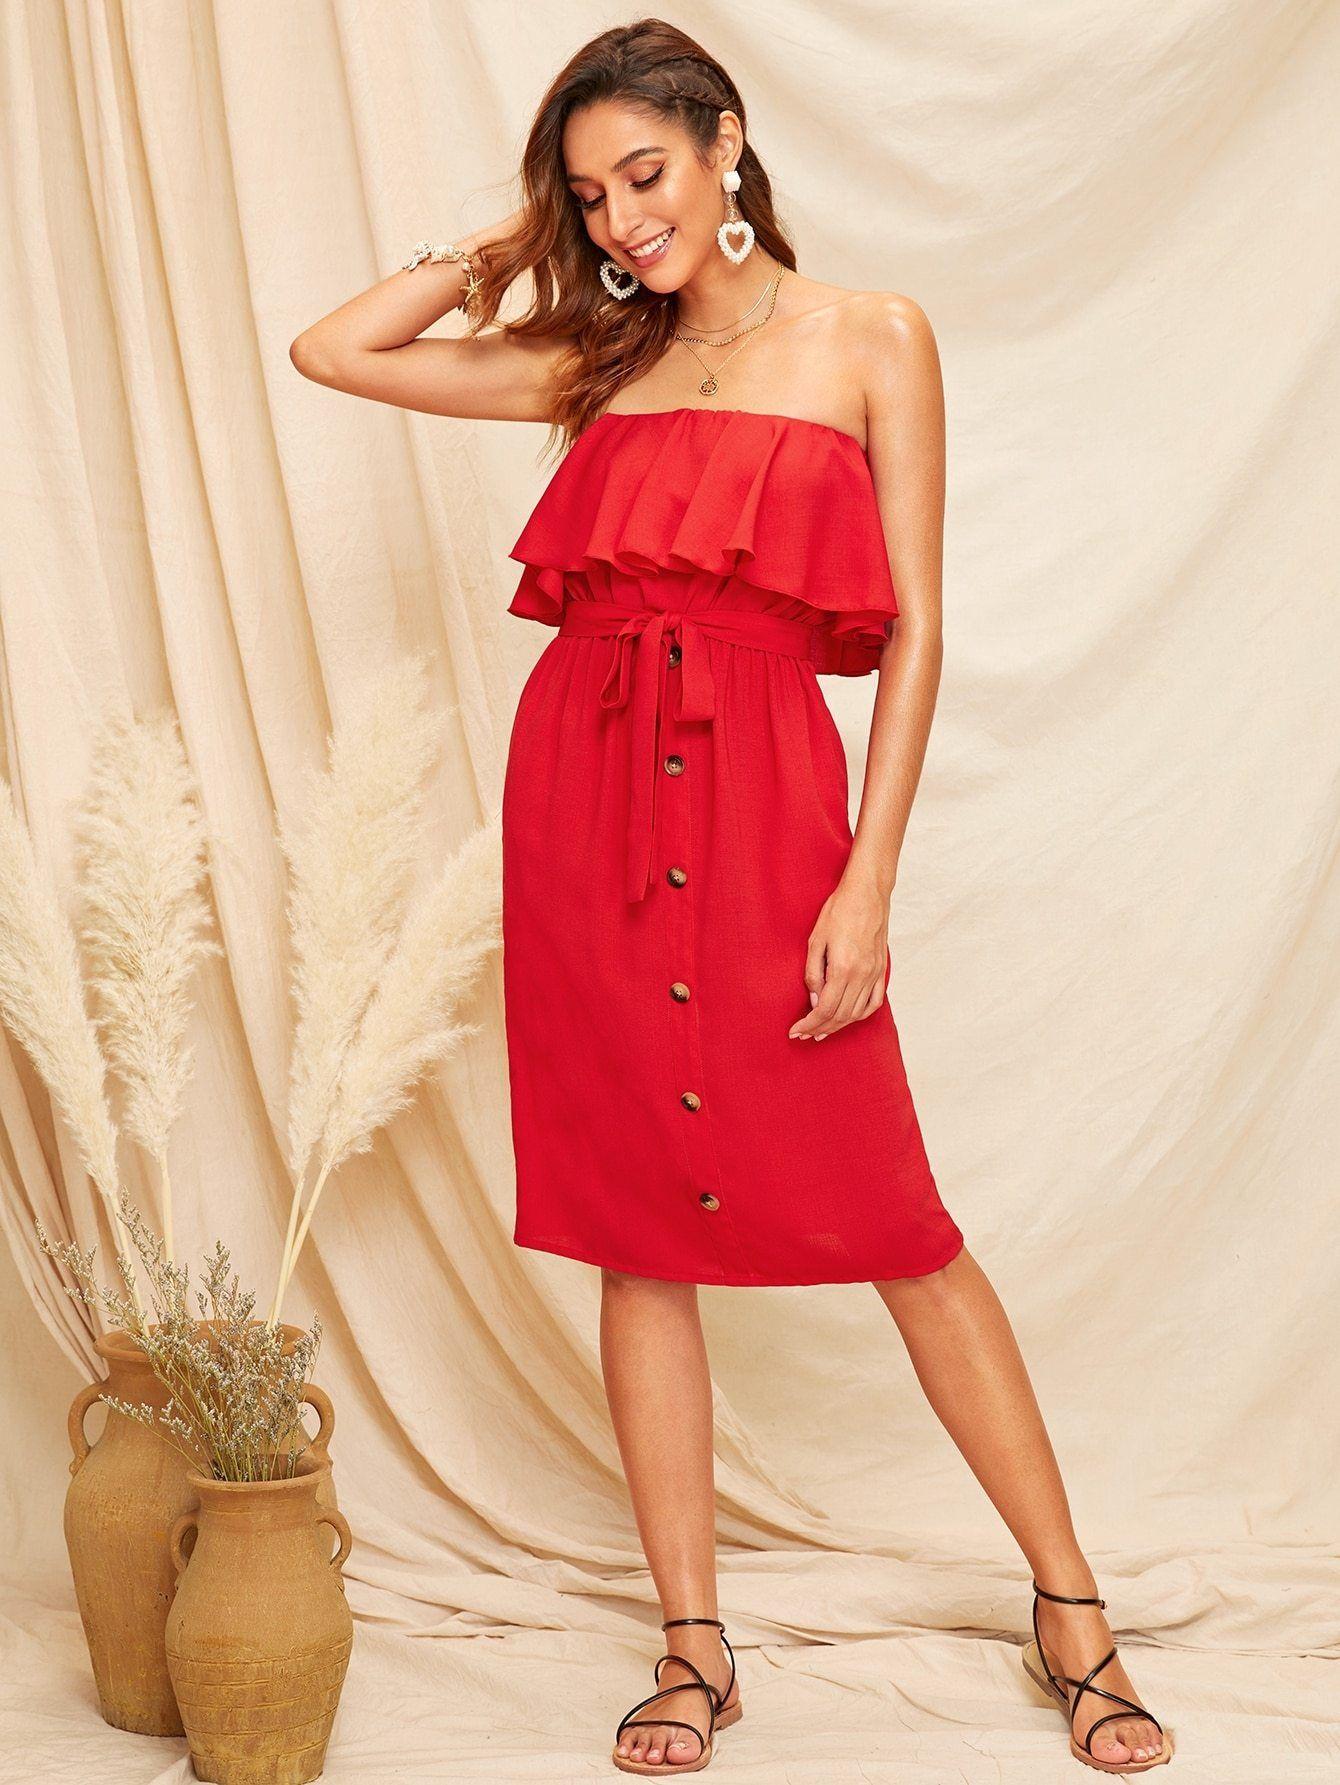 Ruffle Trim Button Front Belted Tube Dress Tube Dress Dresses Summer Pocket Dress [ 1785 x 1340 Pixel ]